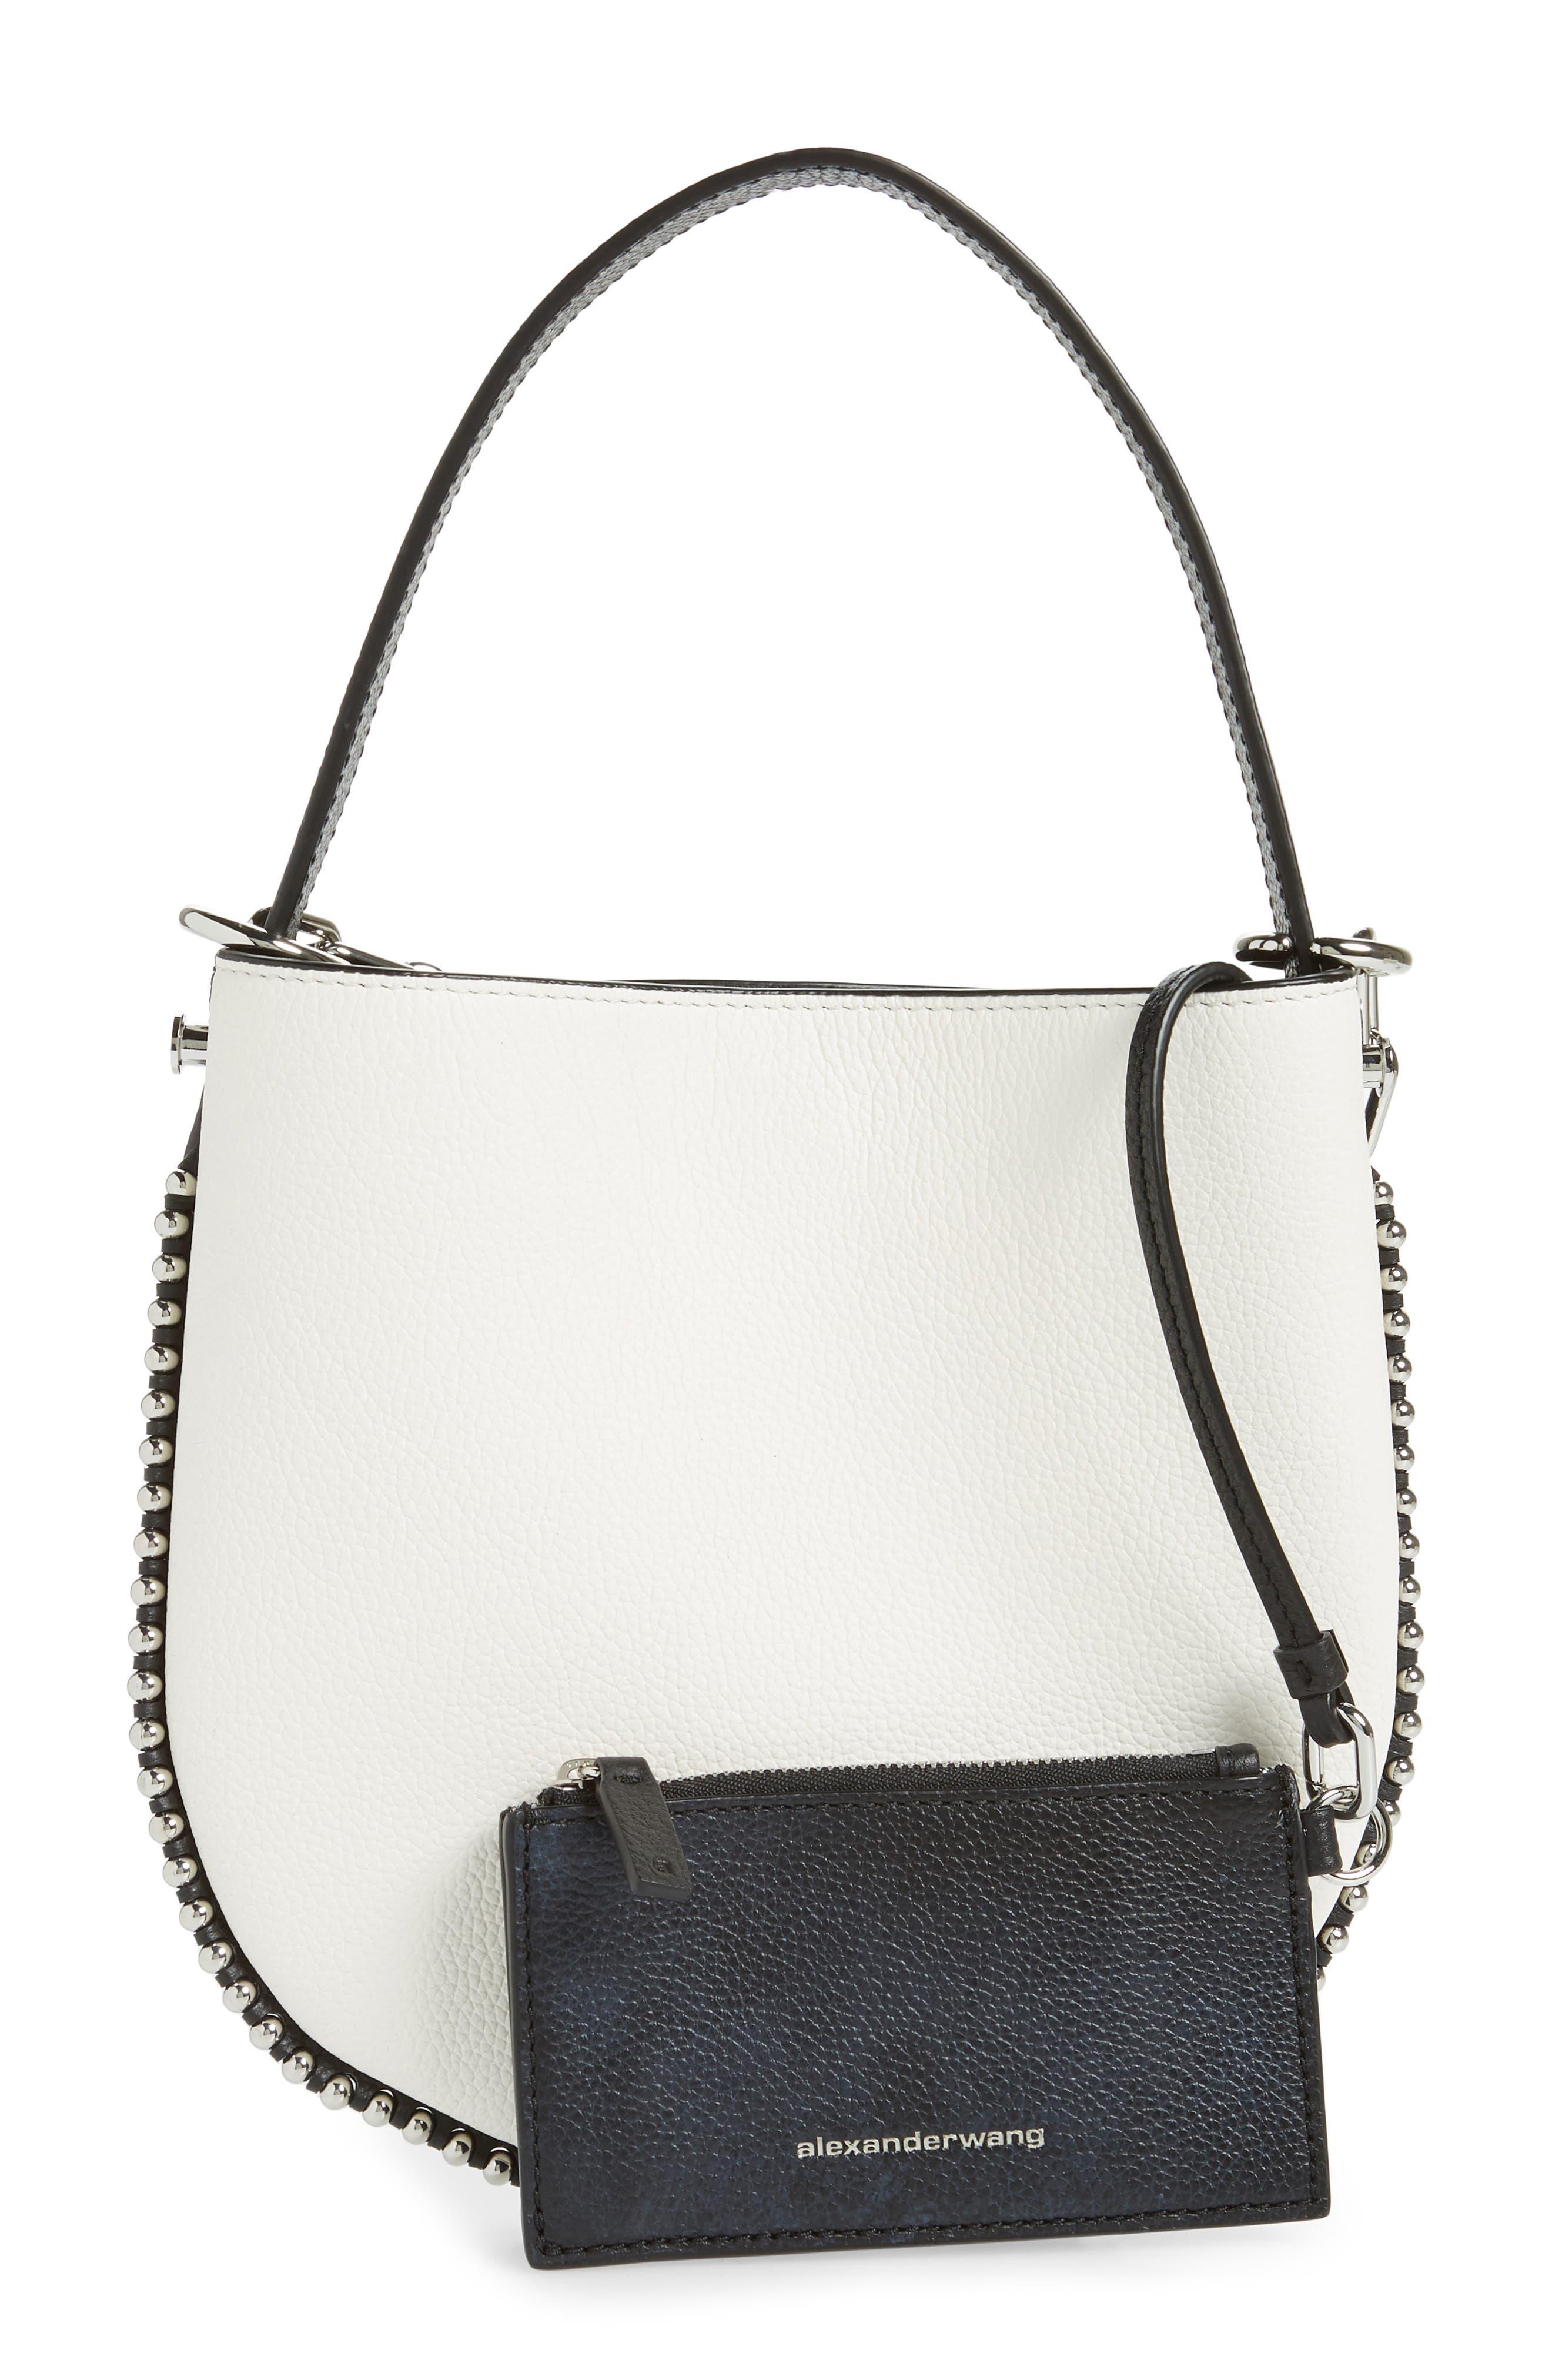 ALEXANDER WANG,                             Mini Roxy Leather Hobo Bag,                             Alternate thumbnail 4, color,                             BLACK/ WHITE